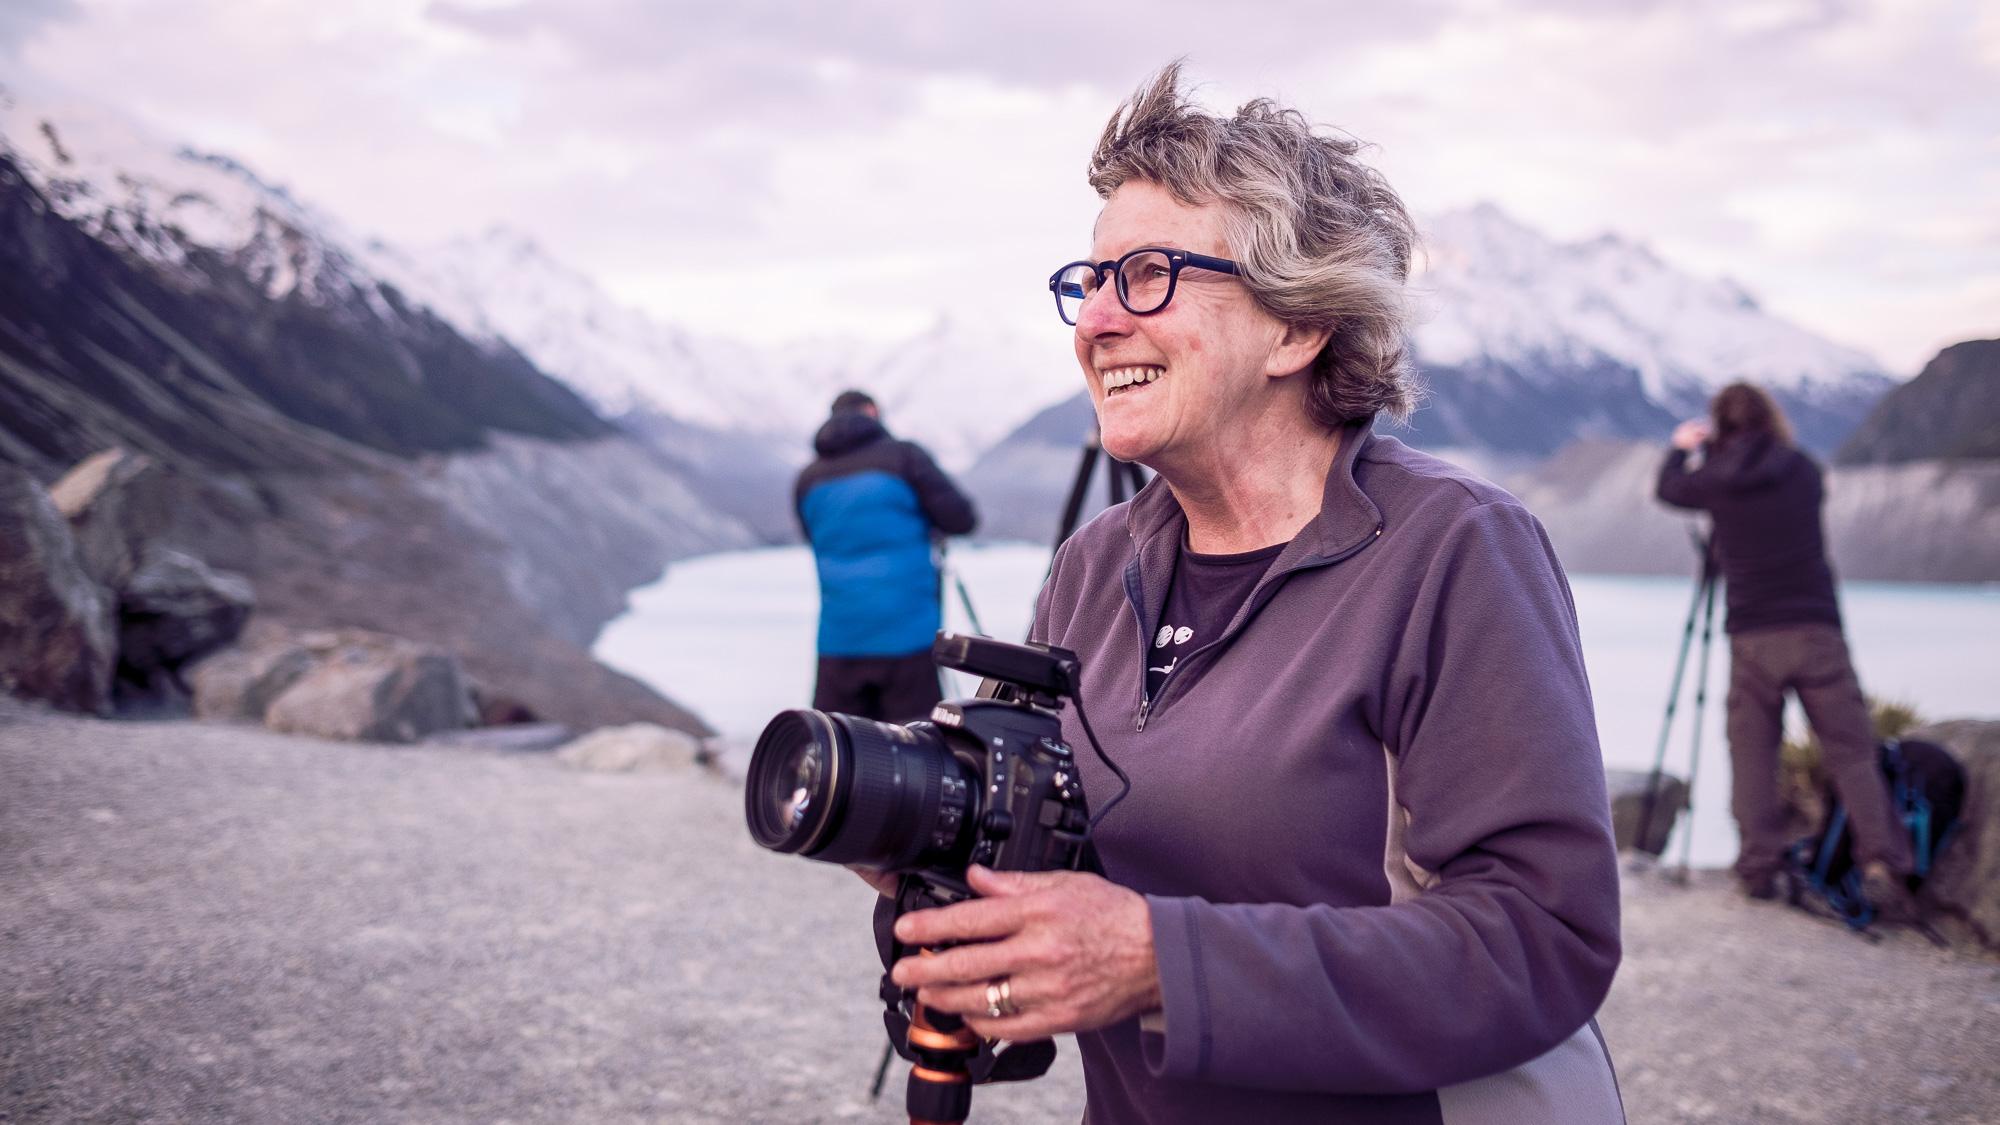 photography-workshop-newzealand-mountcook2018-32.jpg